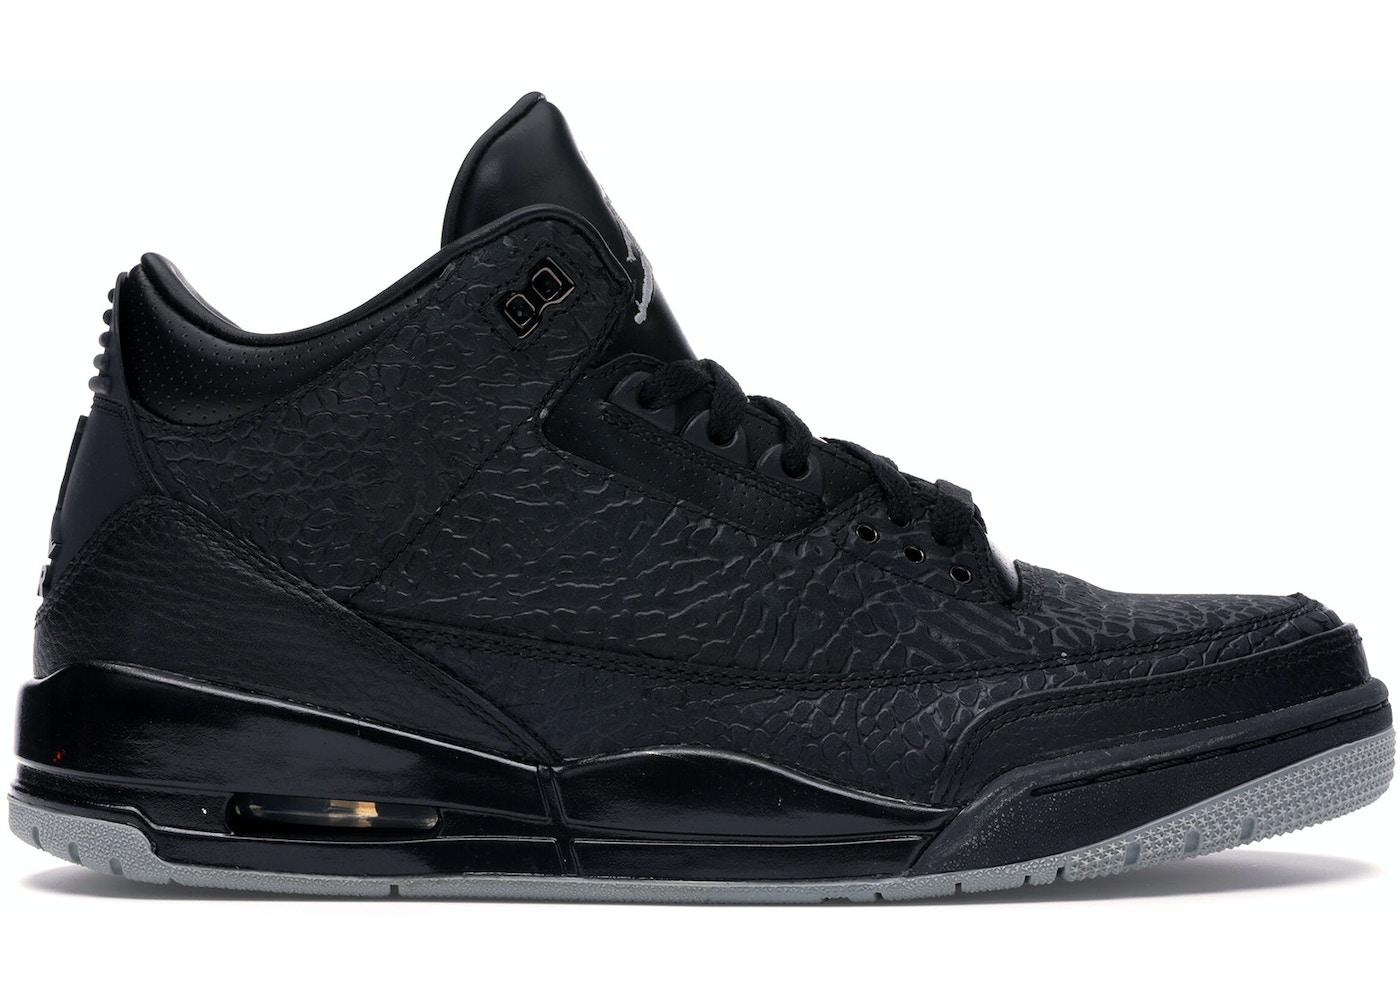 buy online 02f37 b1e0c Buy Air Jordan 3 Size 6 Shoes & Deadstock Sneakers